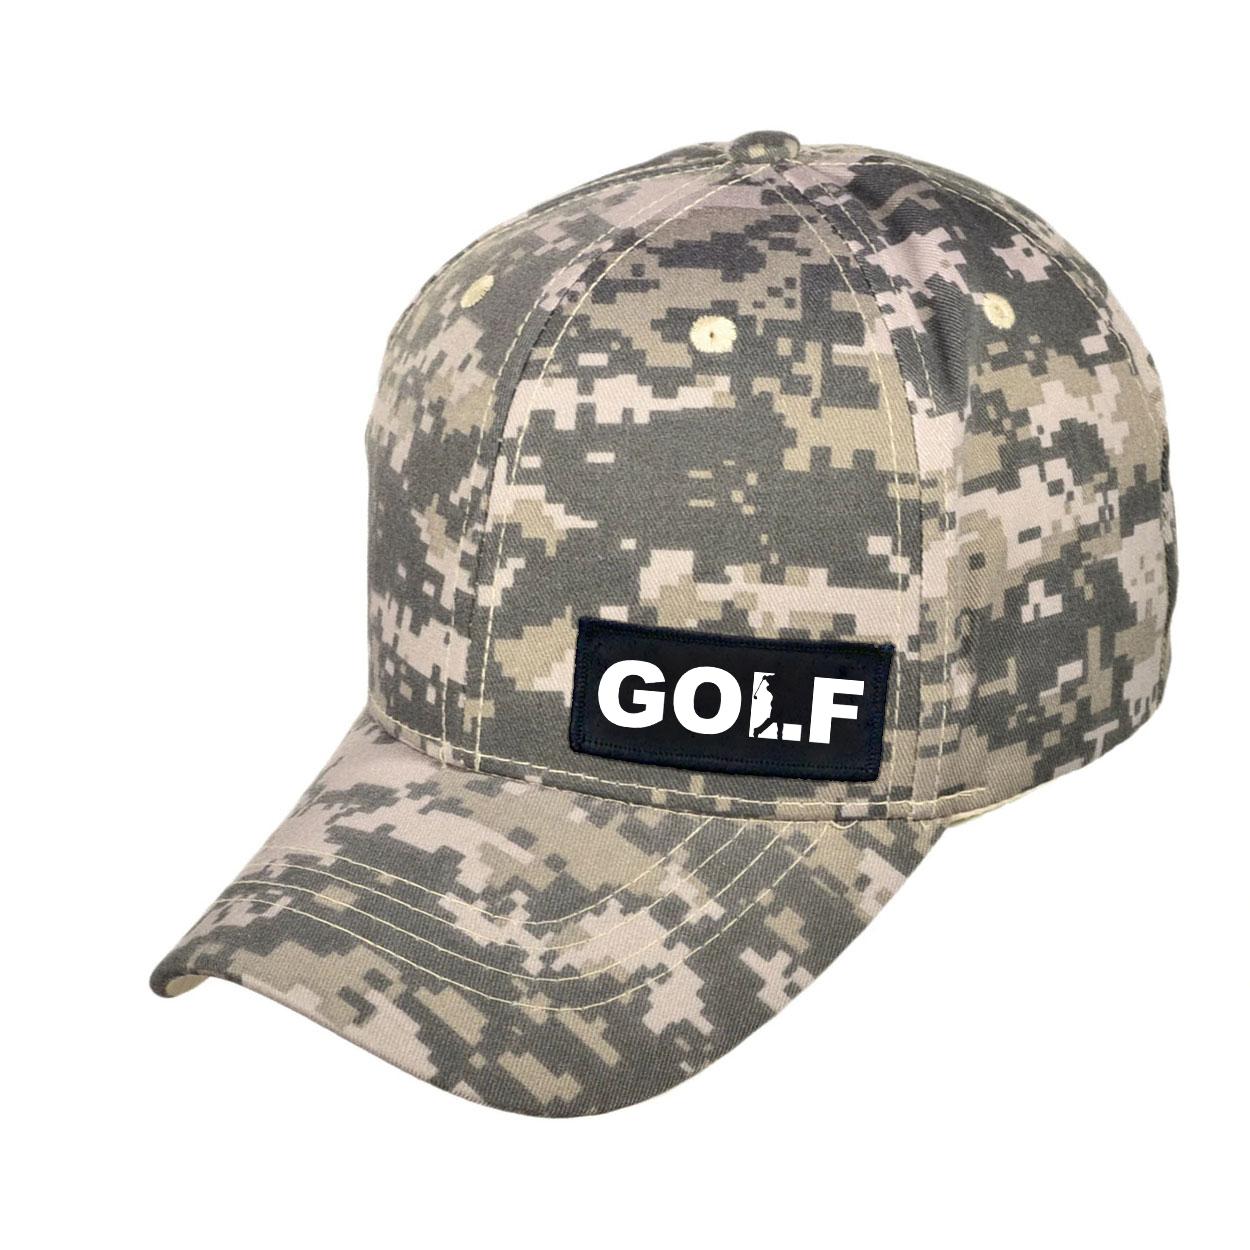 Golf Swing Logo Night Out Woven Patch Hat Digital Camo (White Logo)